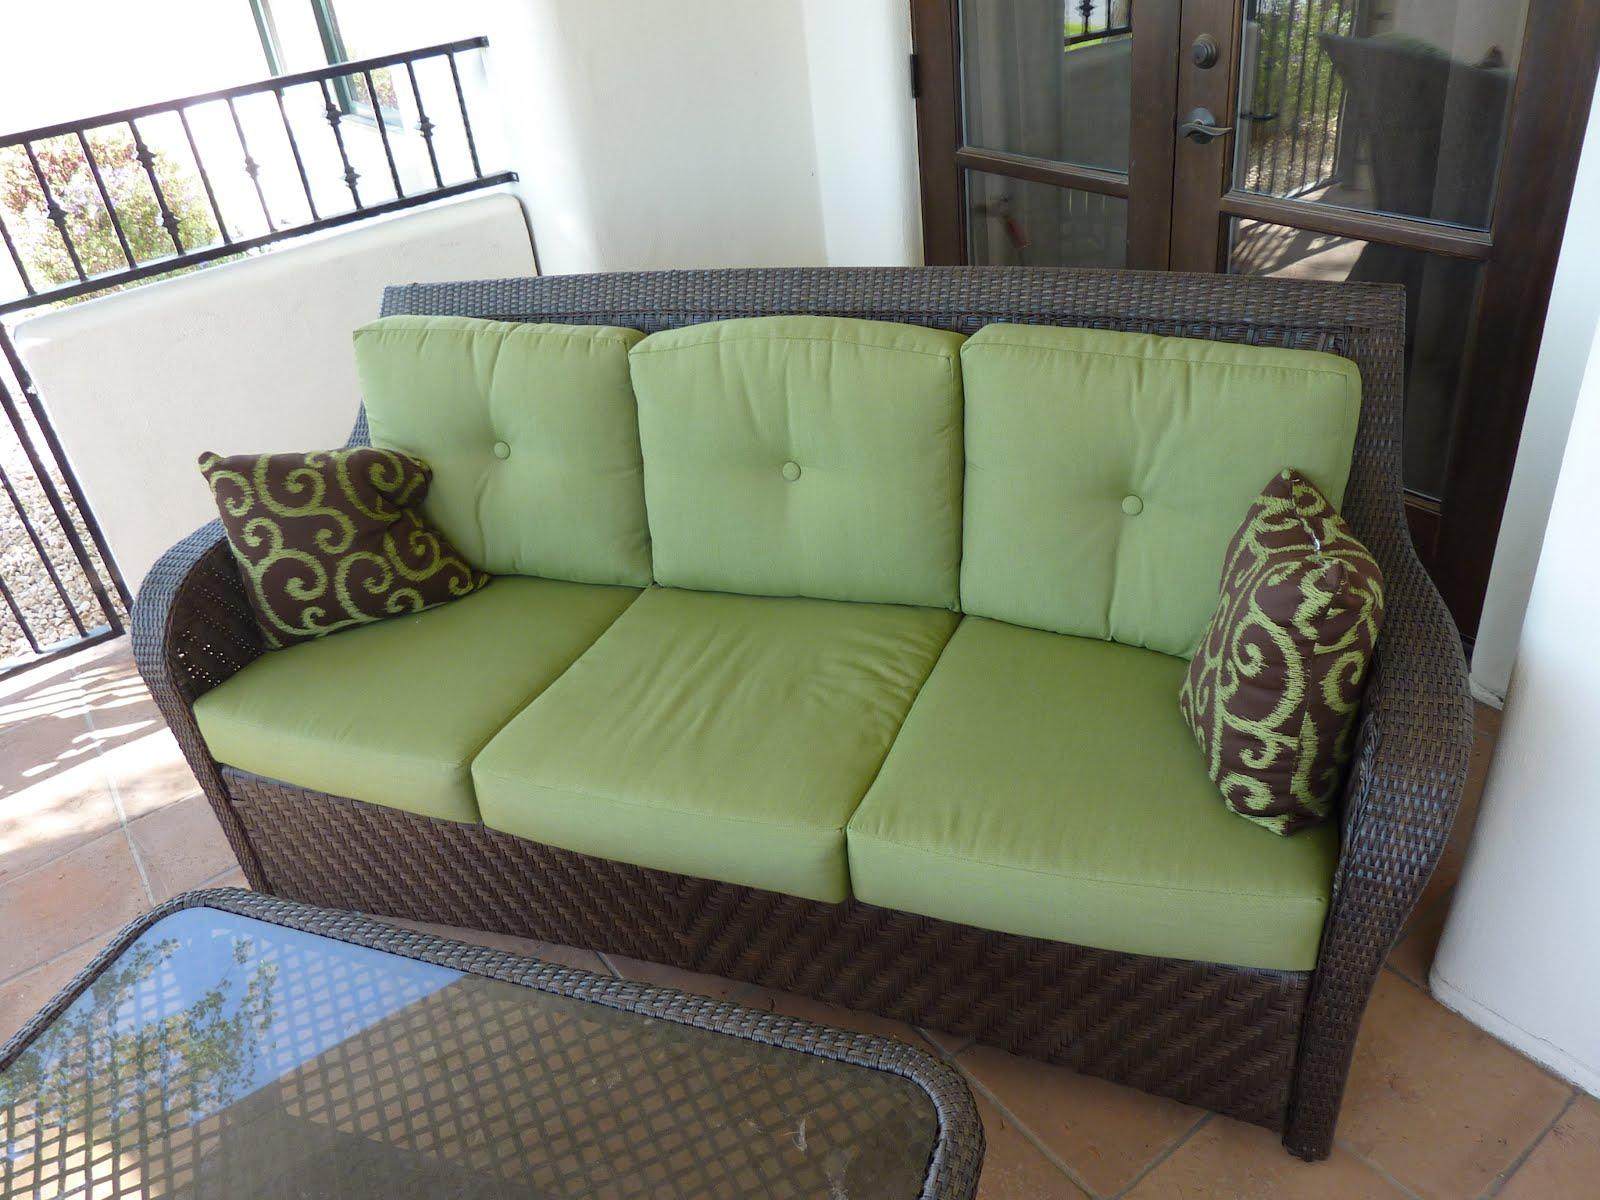 Sam S Club Lawn Chairs Bobby Knight Chair Throw Patio Ideas Design Great